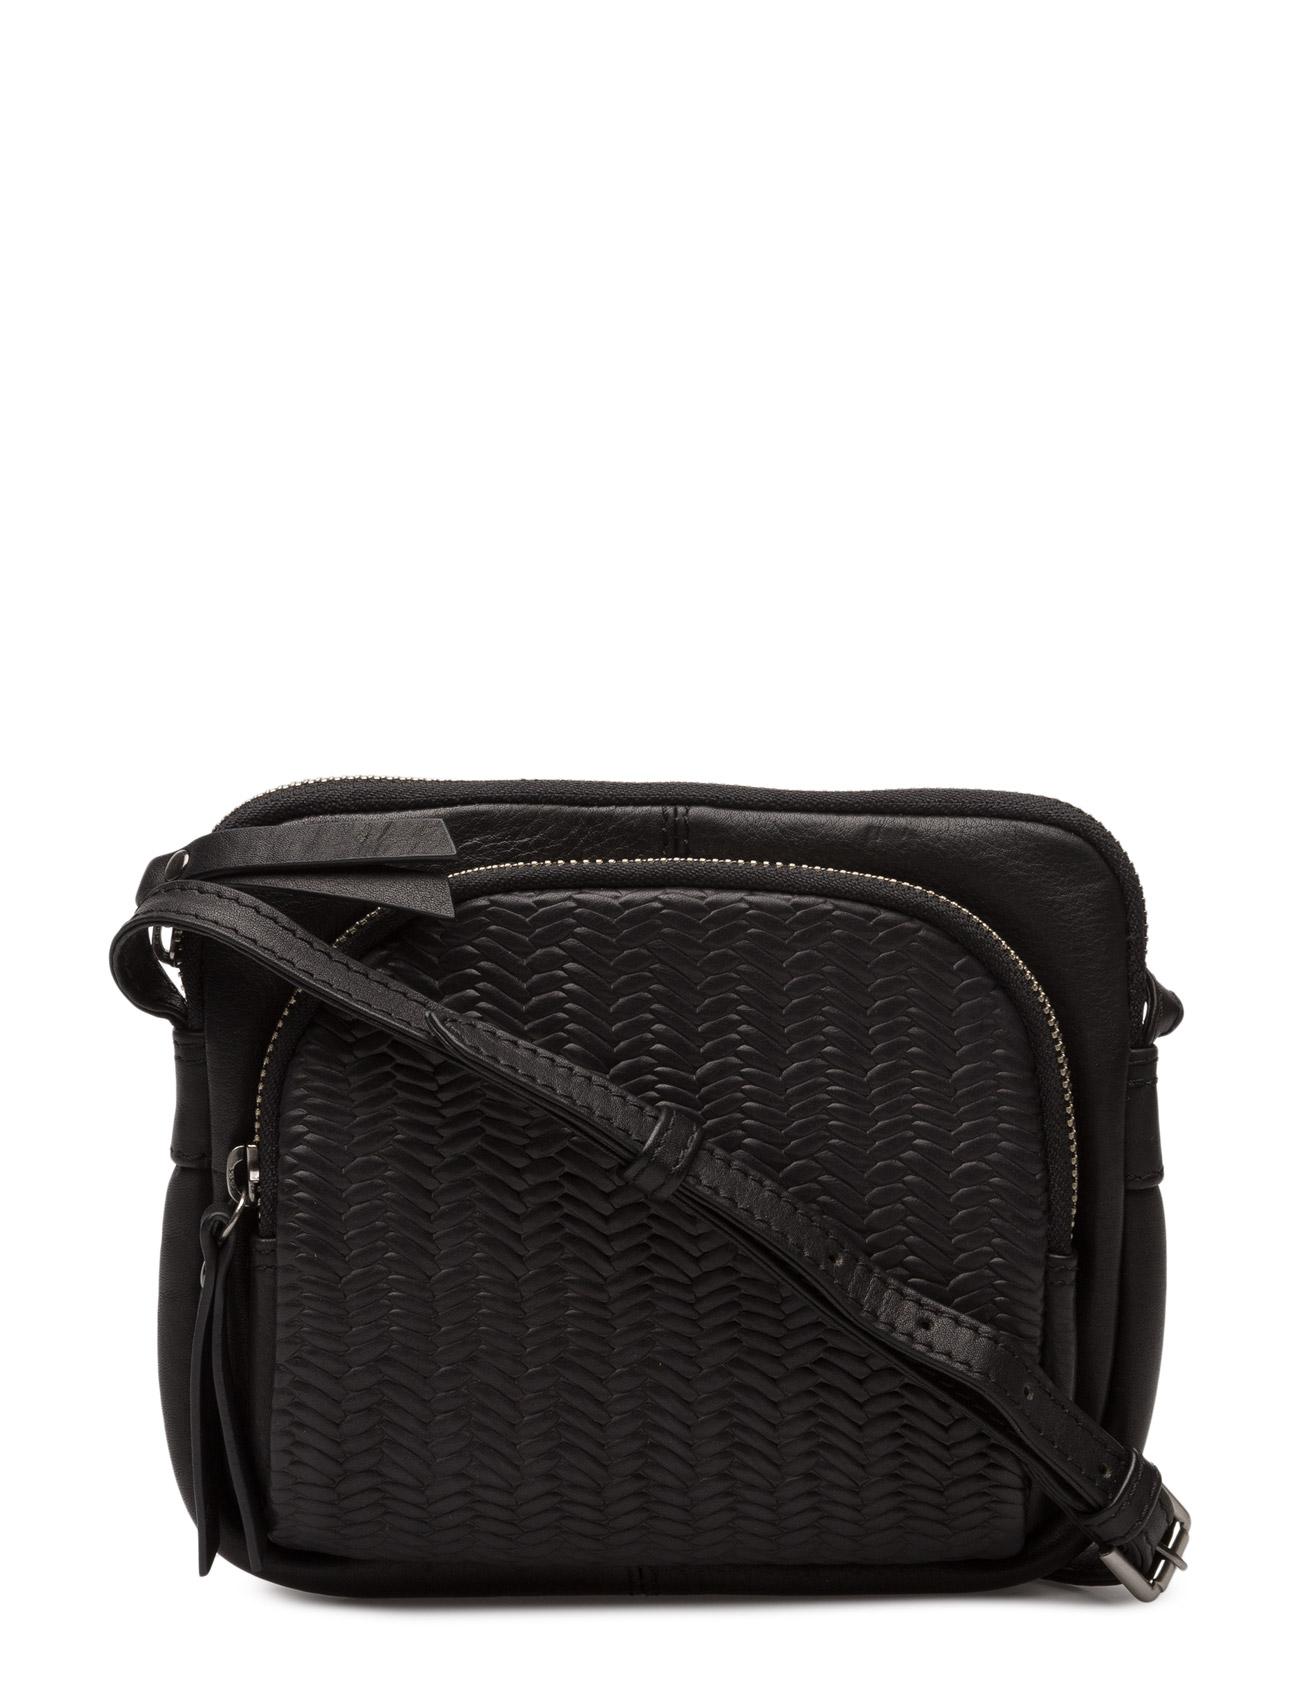 Amira Crossbody Bag, Woven Markberg Skulder Tasker